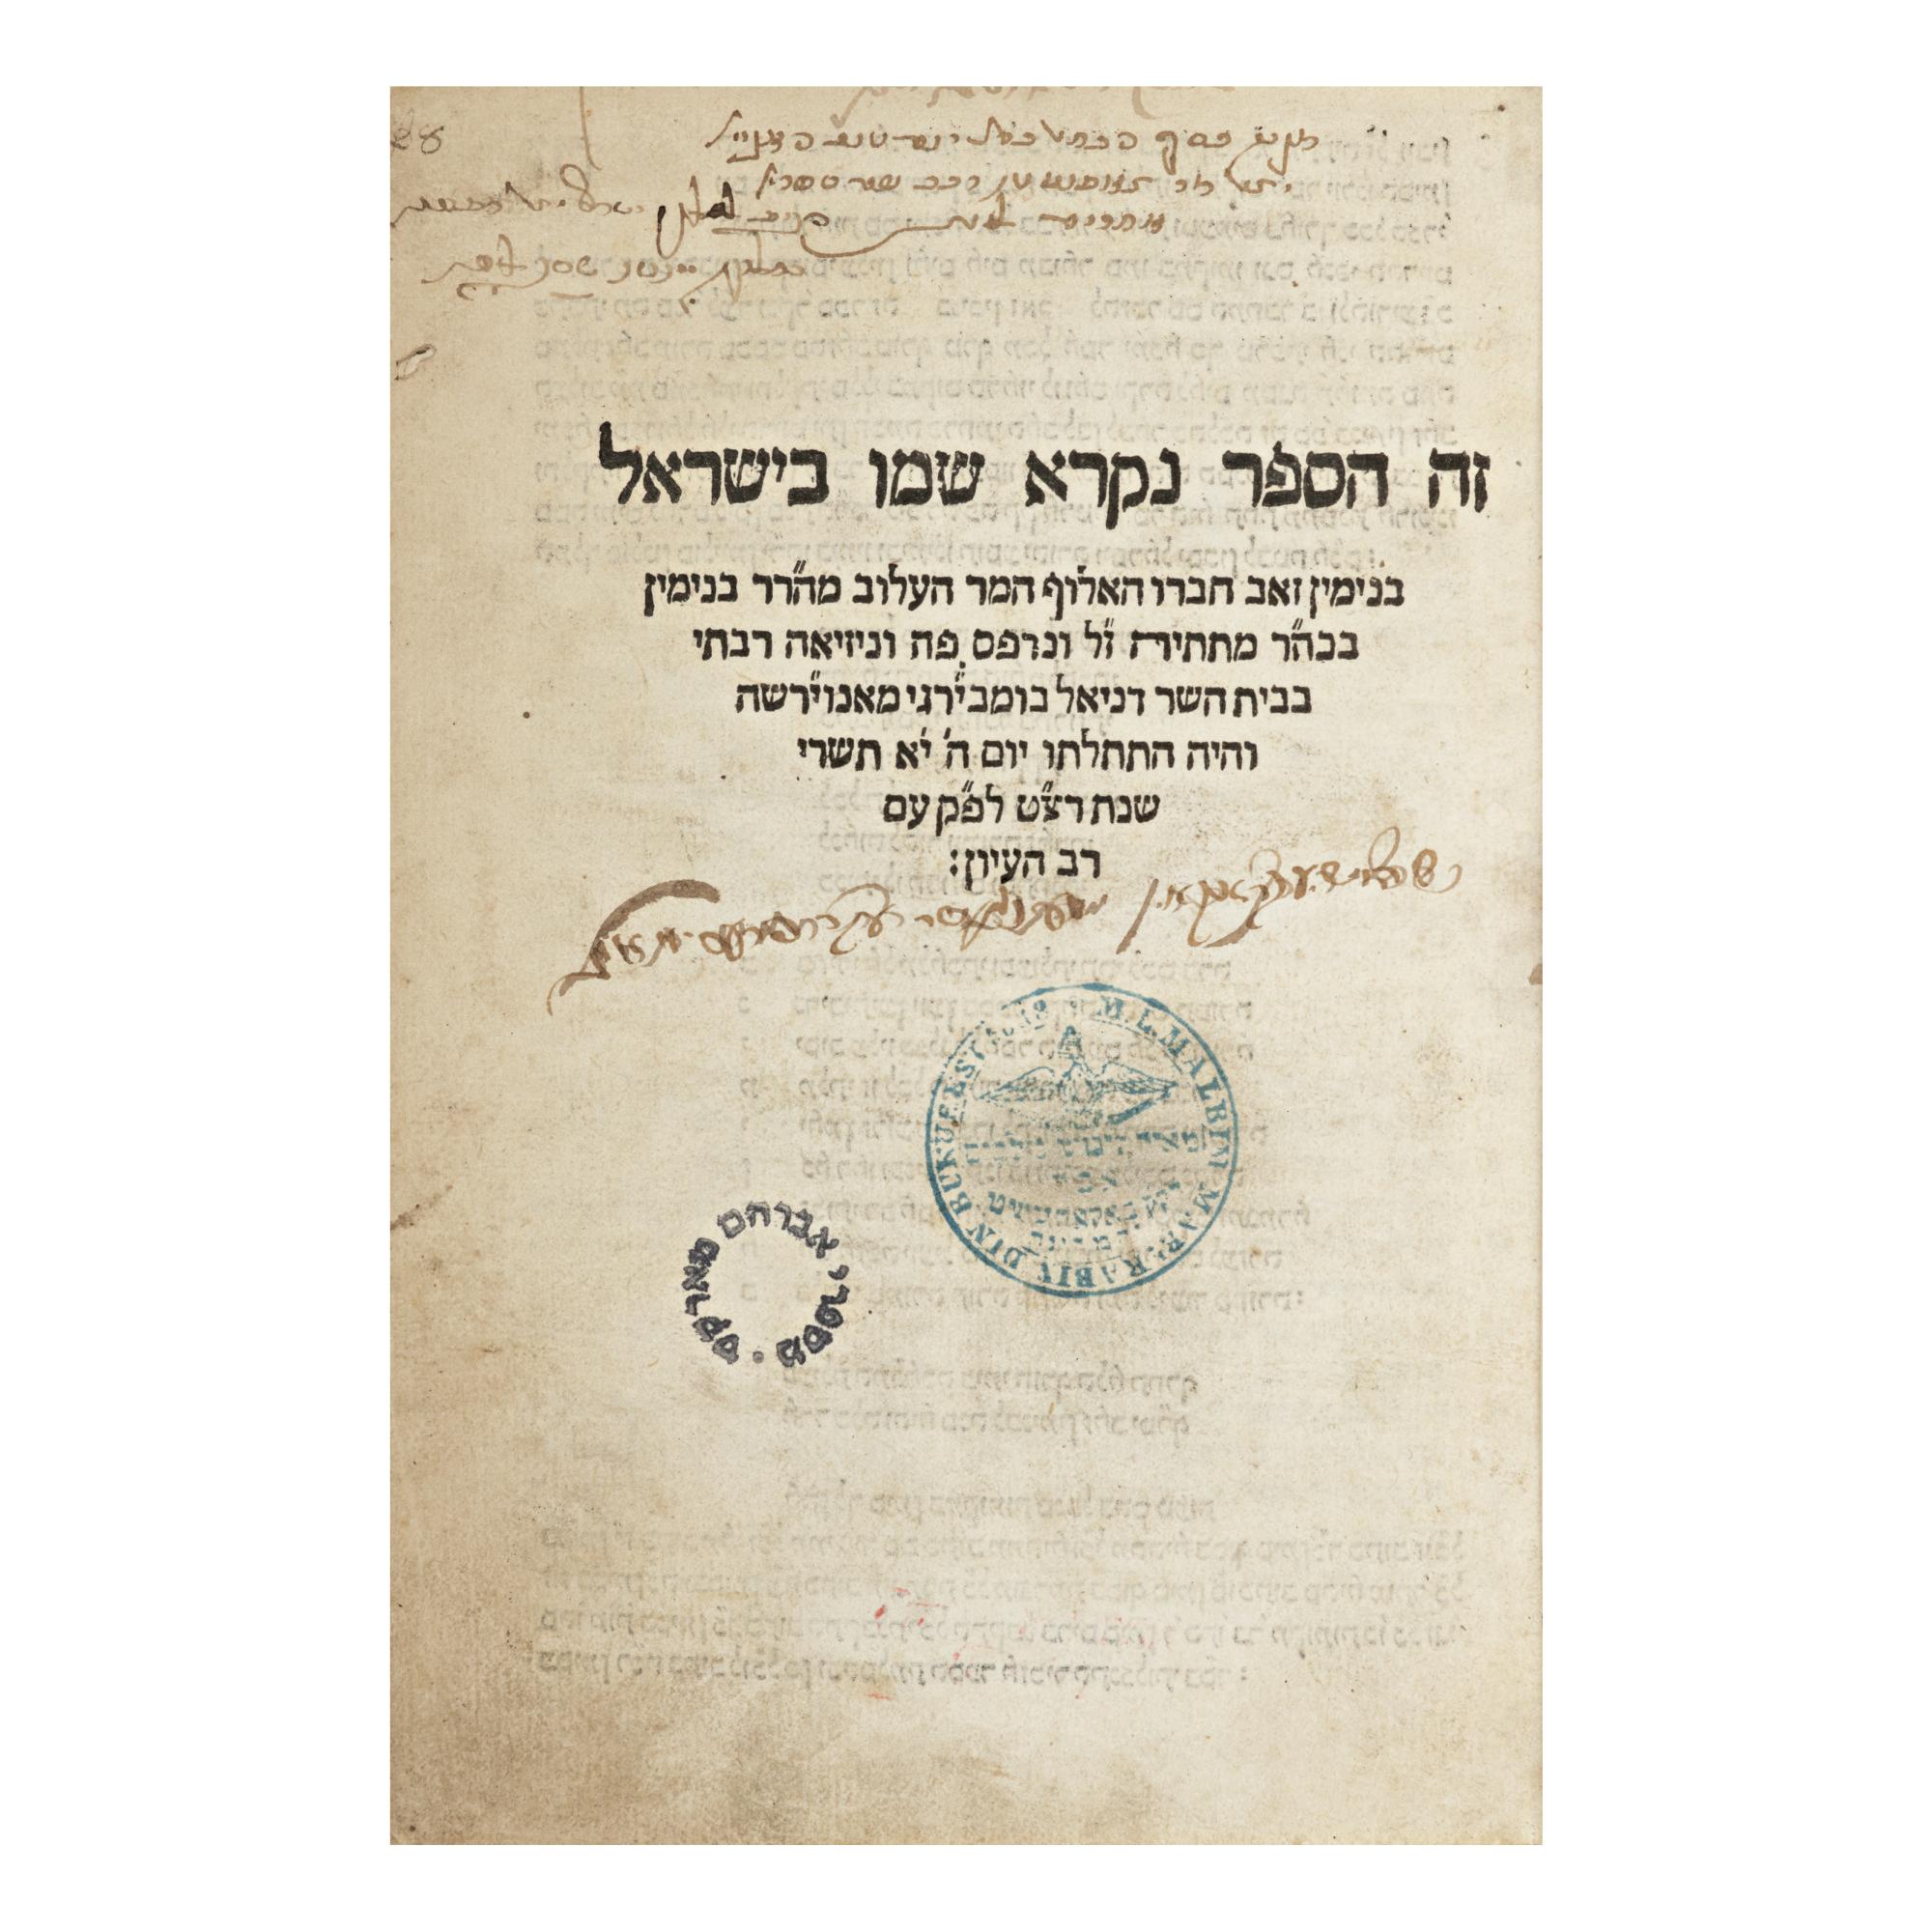 SEFER BINYAMIN ZE'EV (RESPONSA AND LEGAL DECISIONS), RABBI BENJAMIN ZE'EV BEN MATTATHIAS OF ARTA, VENICE: DANIEL BOMBERG, 1538-1539